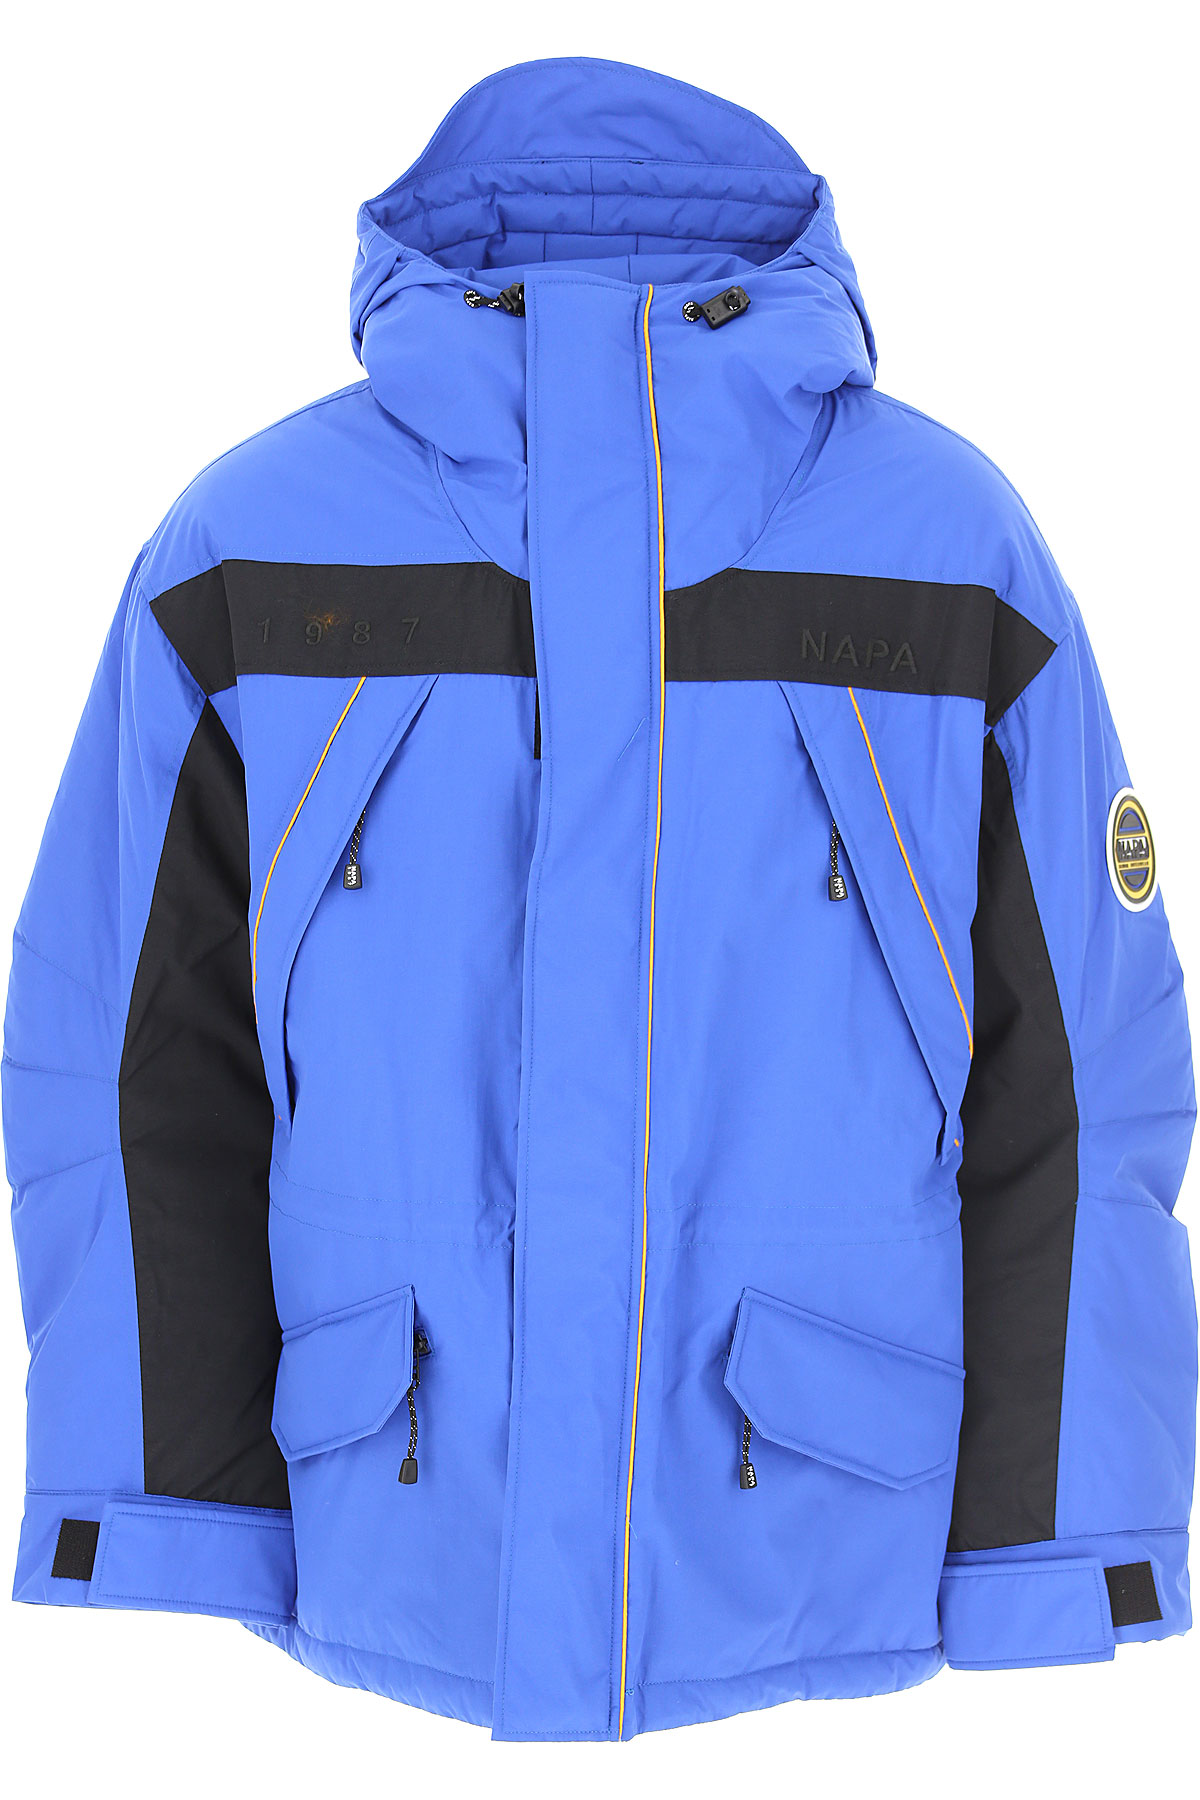 Napapijri Down Jacket for Men, Puffer Ski Jacket On Sale, Princess Blue, polyamide, 2019, L M S